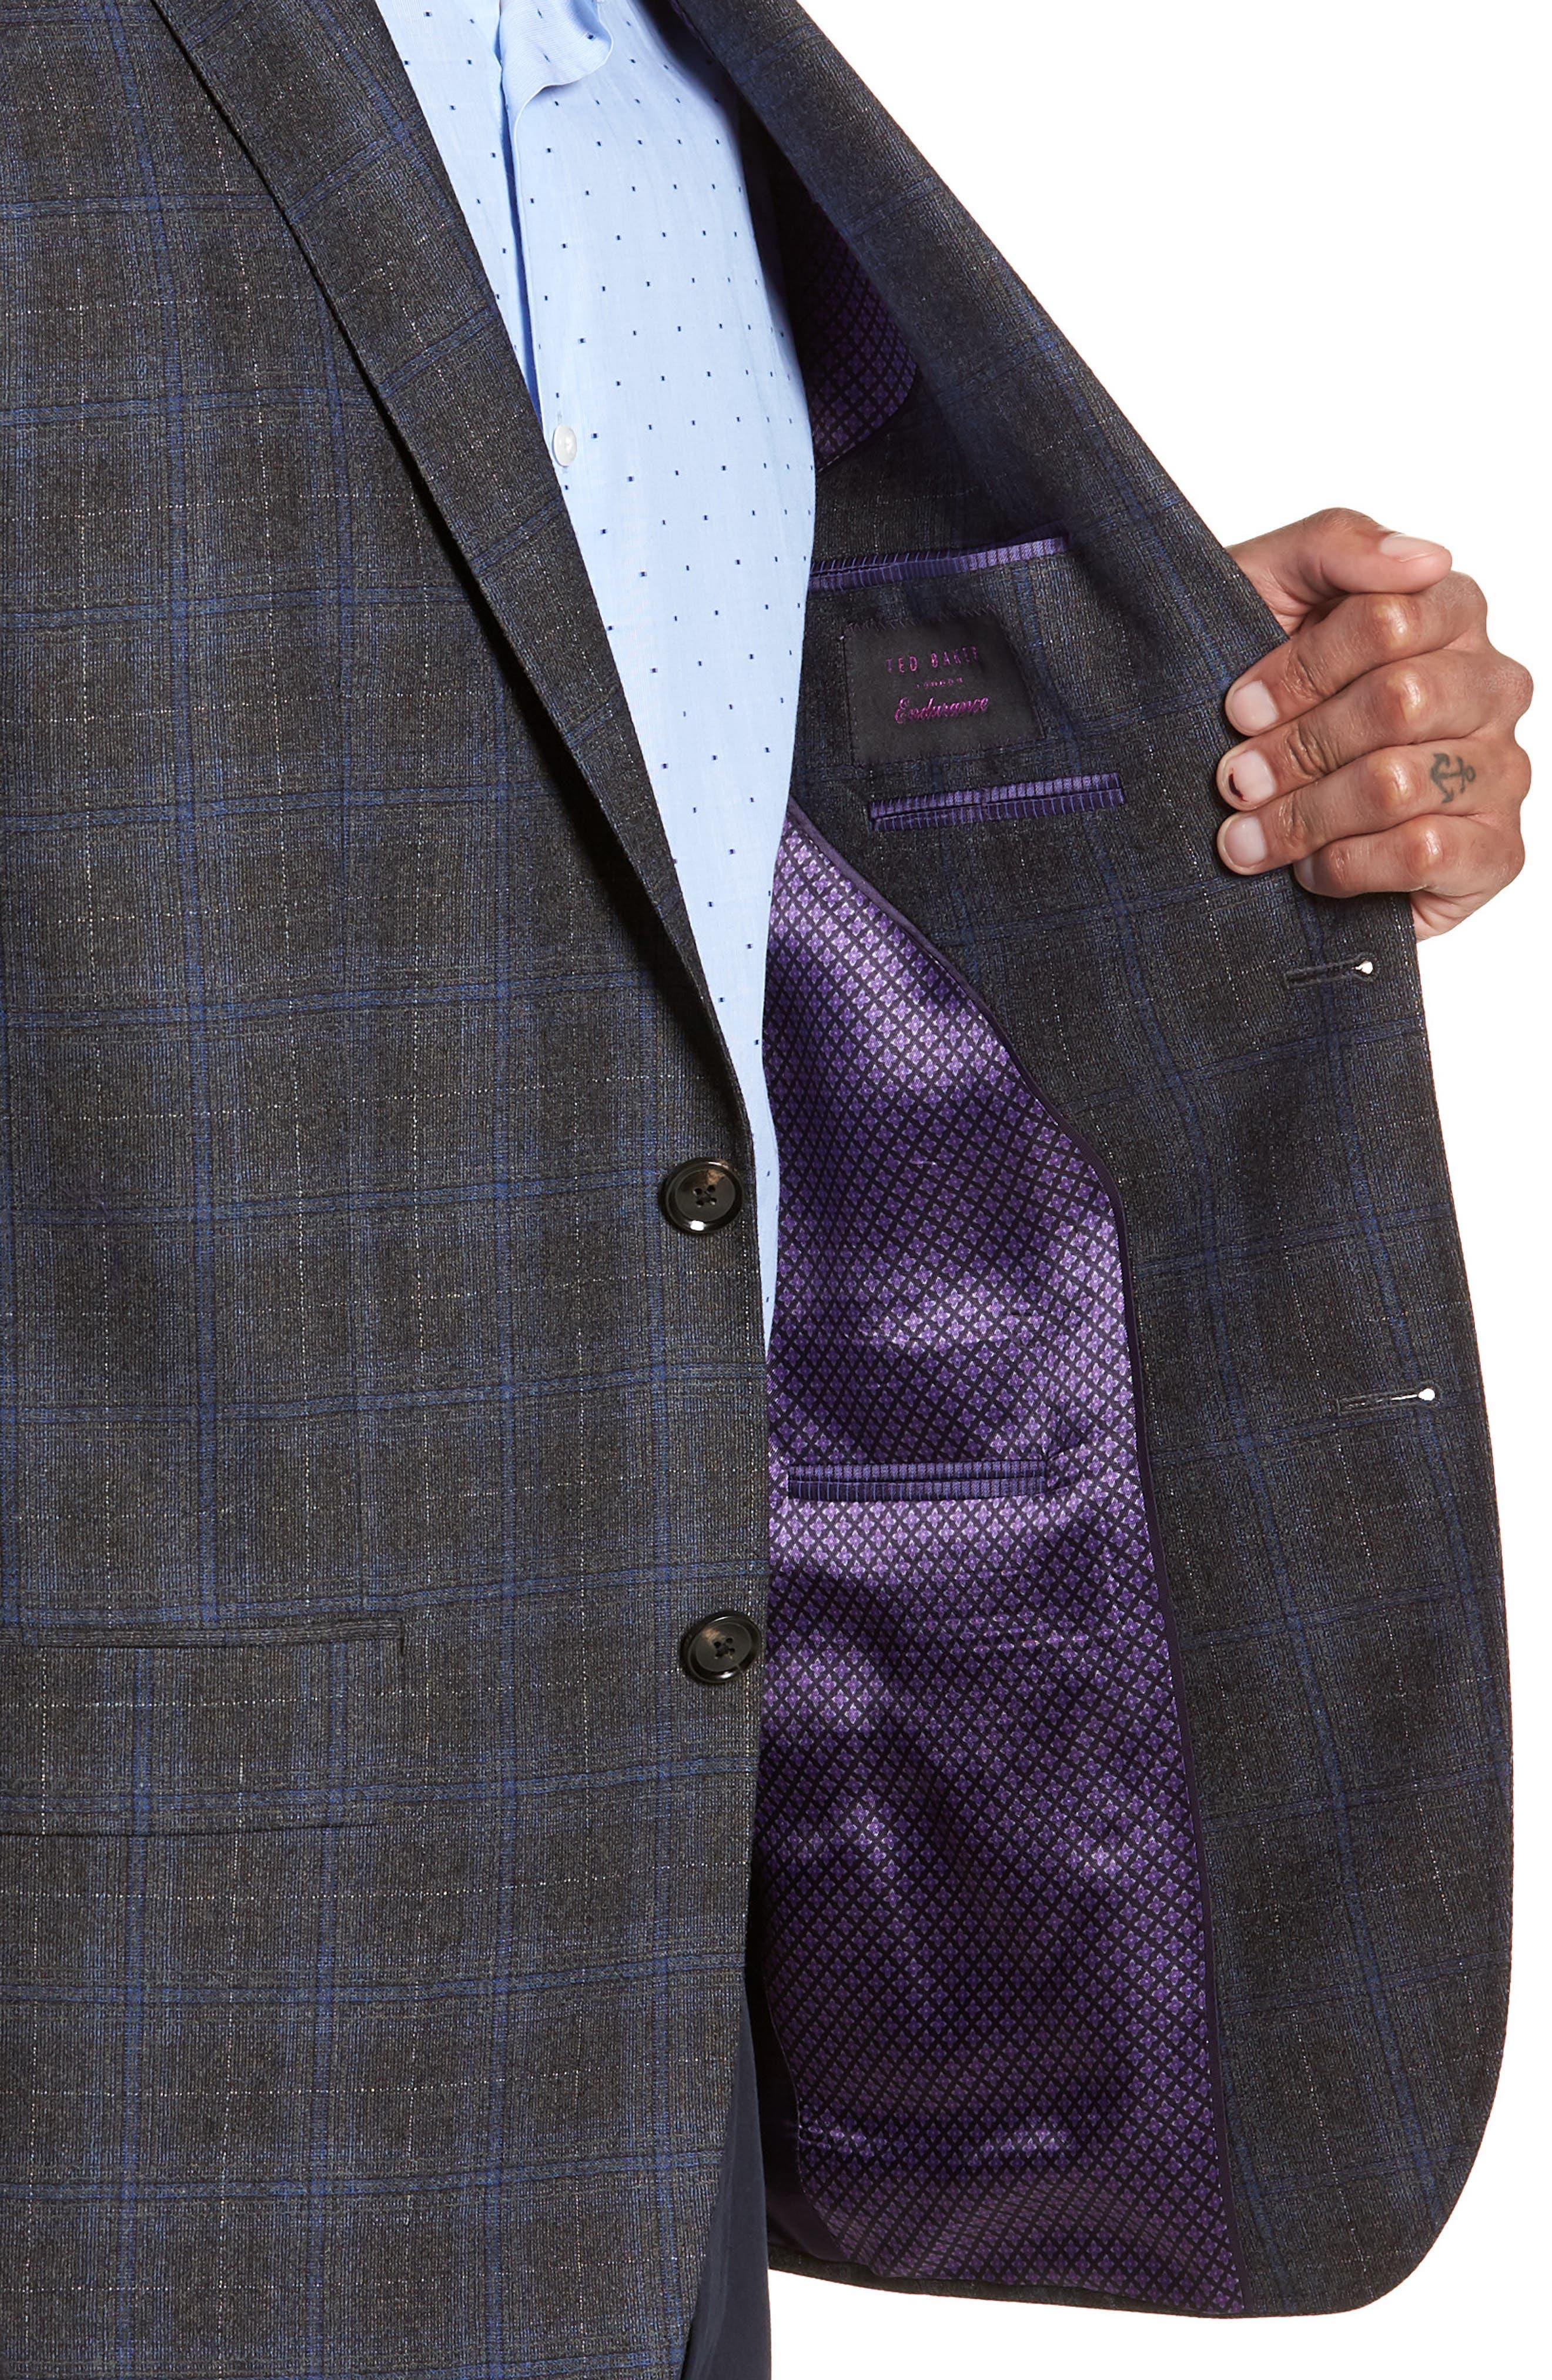 Konan Trim Fit Plaid Wool Sport Coat,                             Alternate thumbnail 4, color,                             020